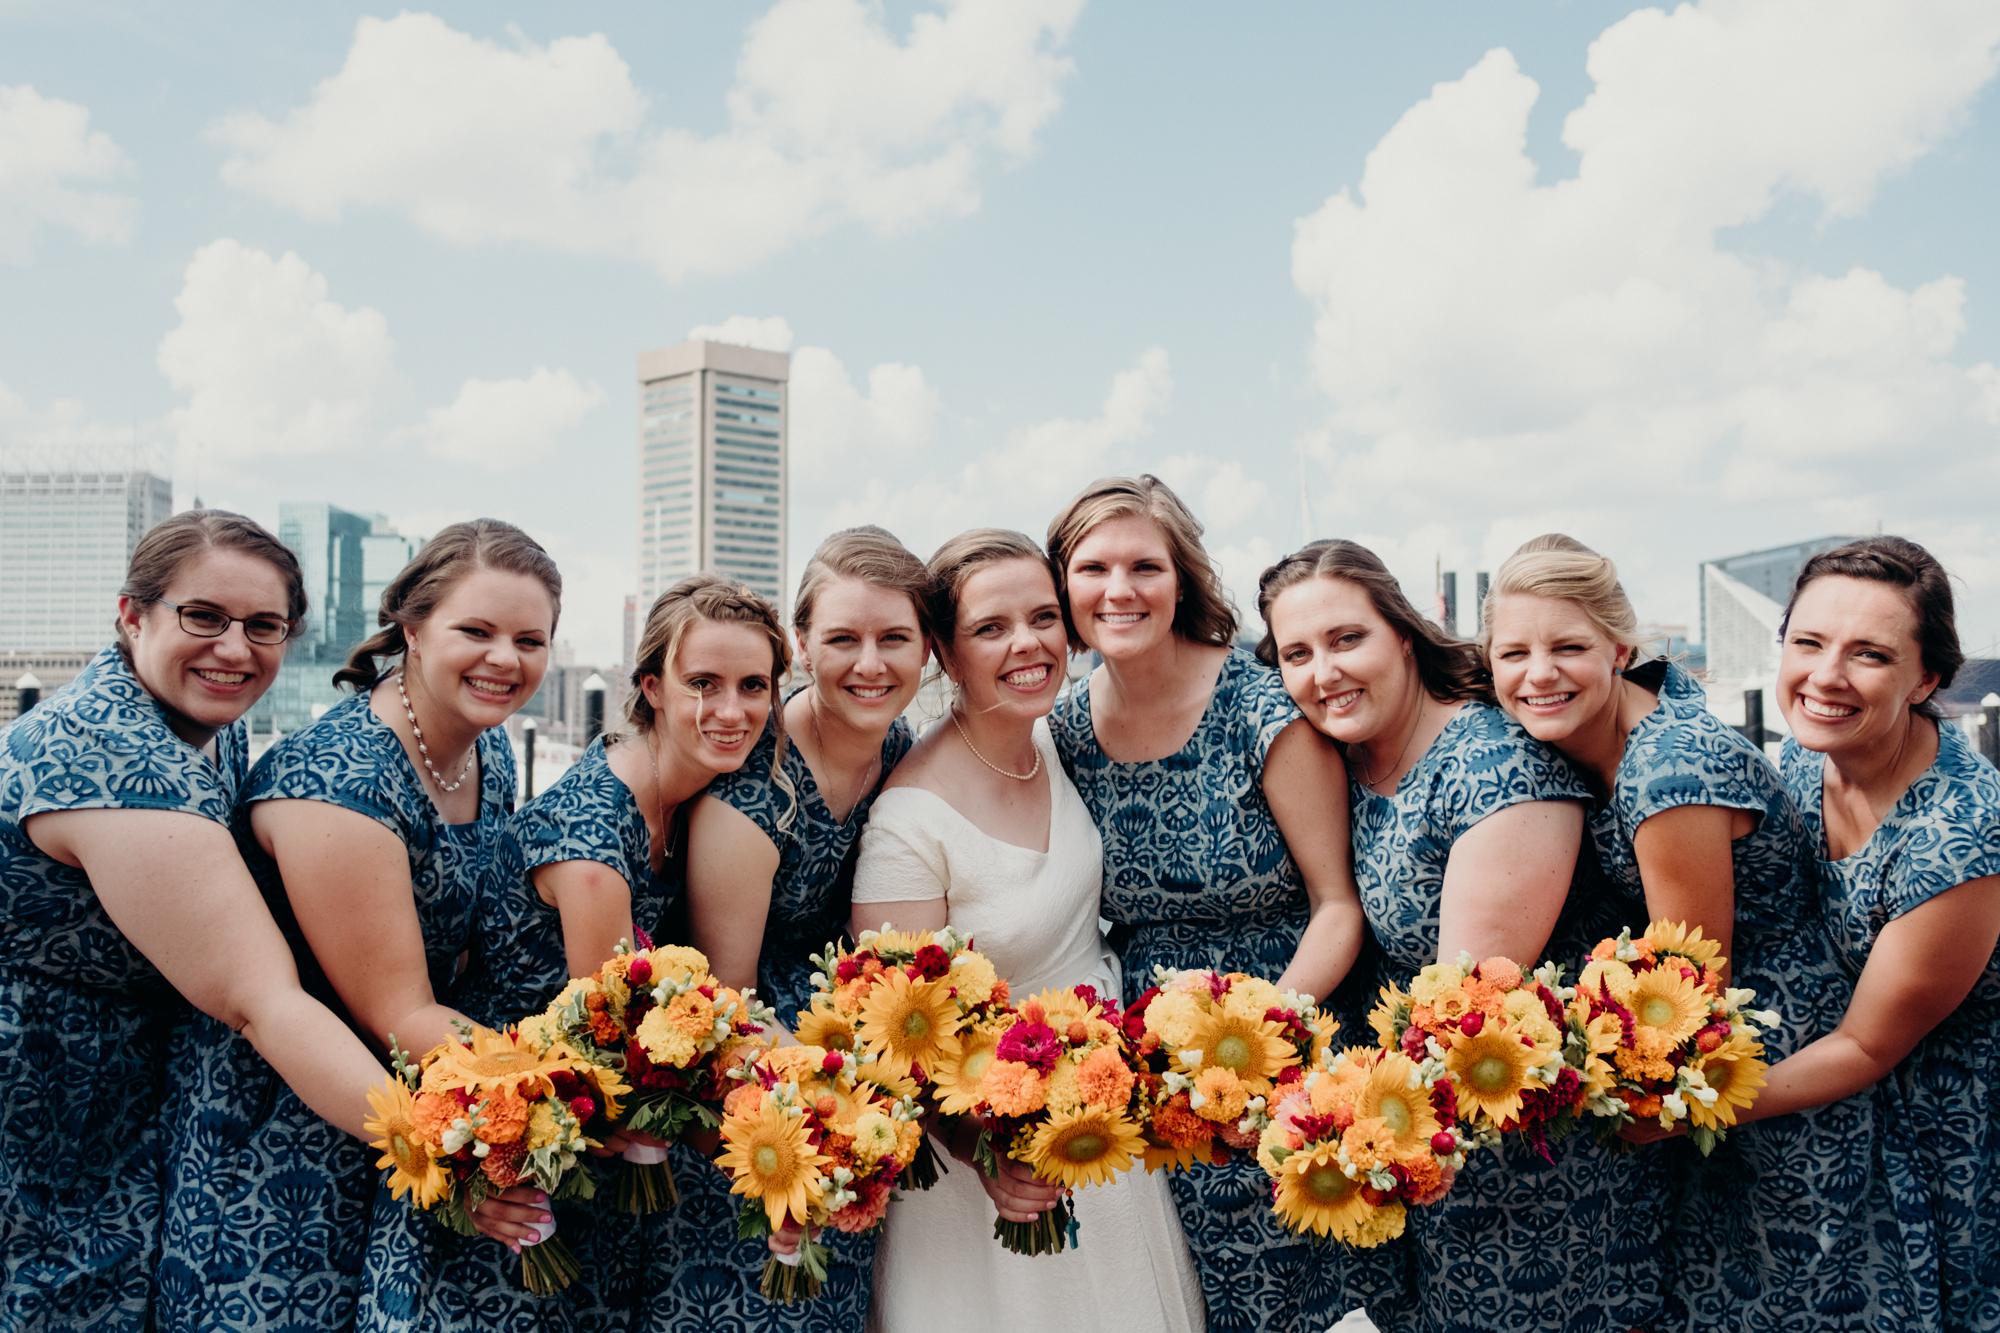 catholic-social-teaching-wedding-17.jpg